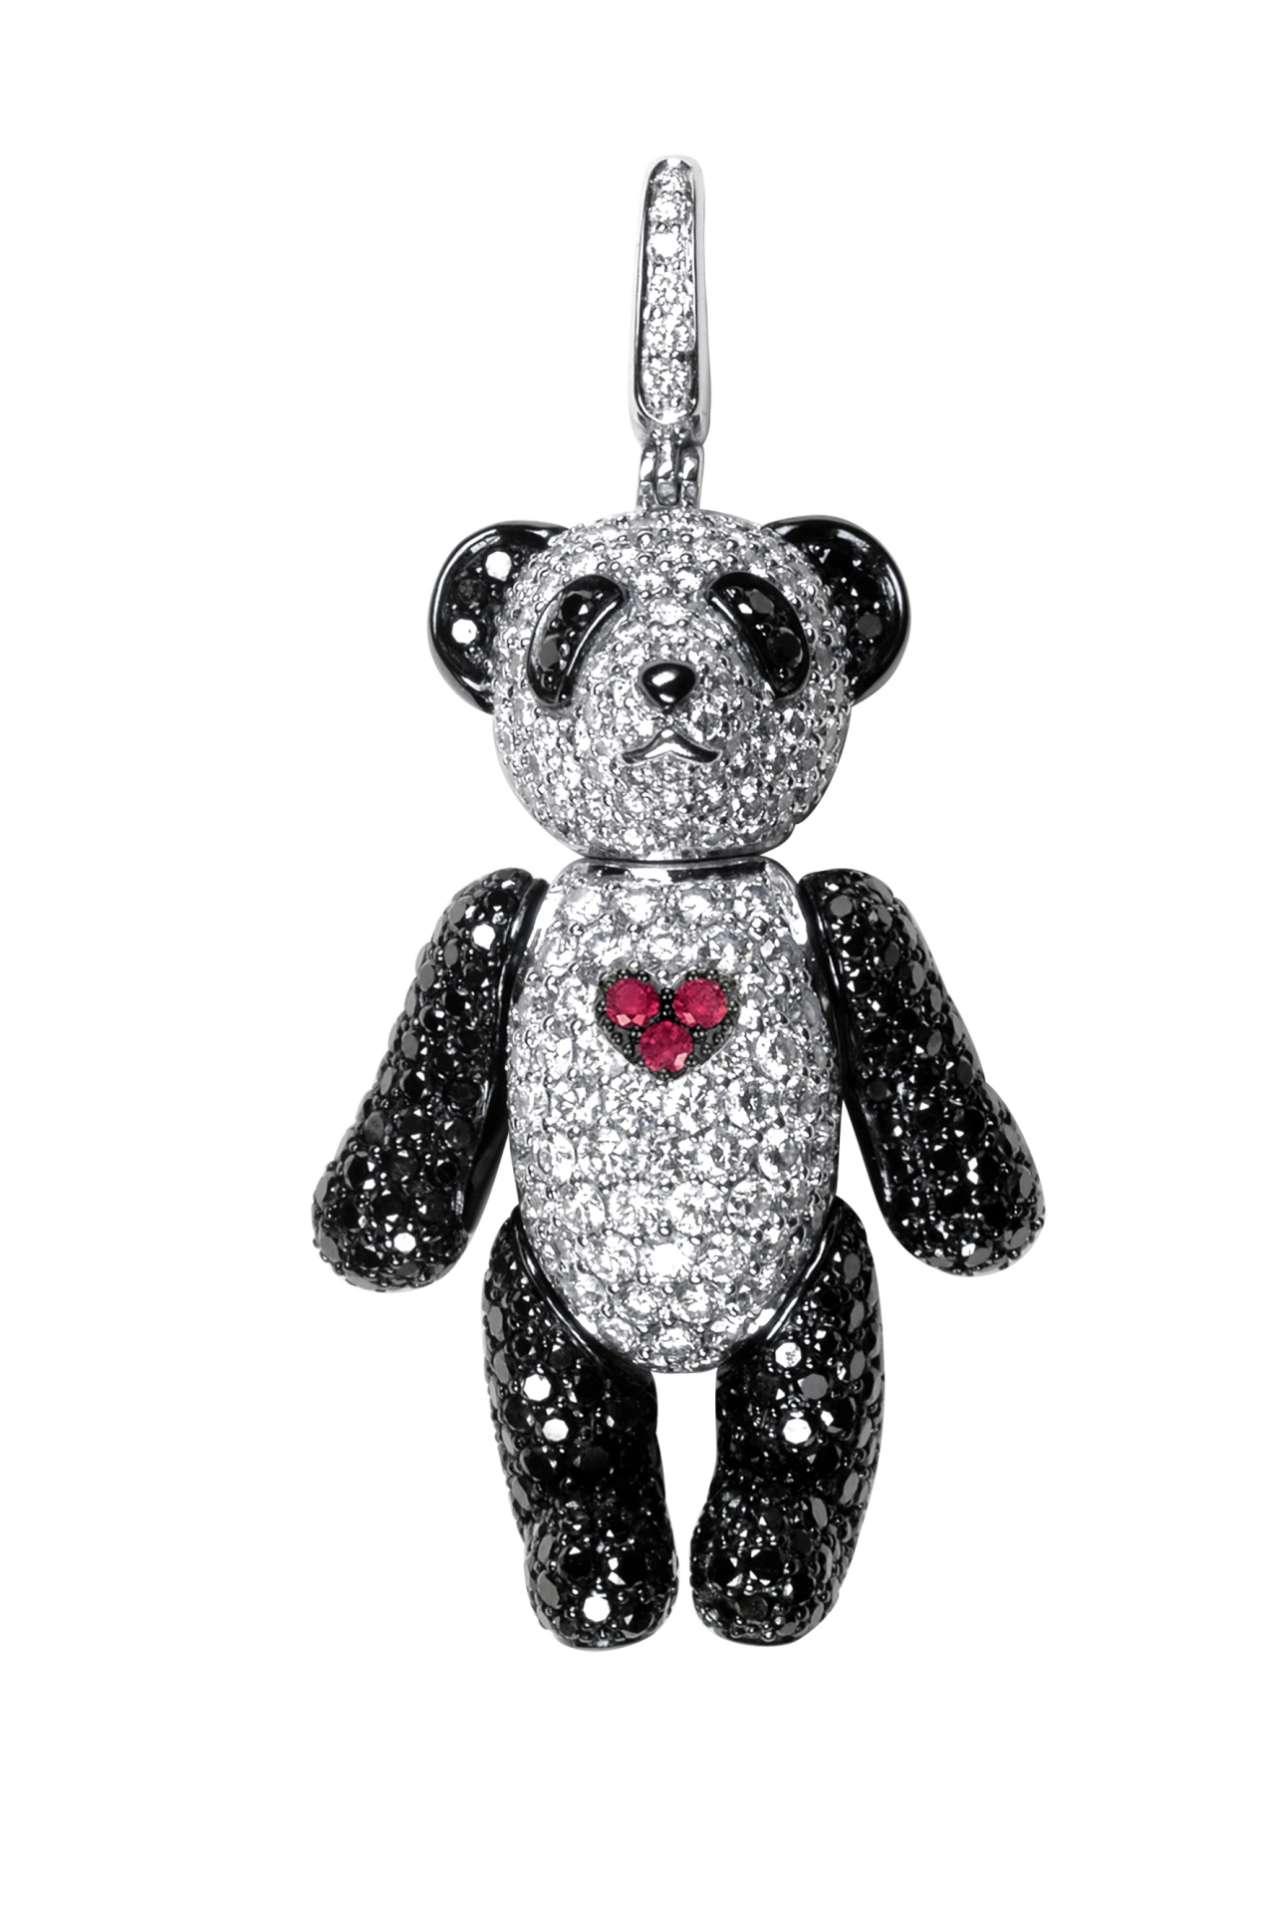 Qeelin_Large Je T'aime Bo Bo 18K 白金鑽石、黑鑽石與紅寶石愛心造型大型吊墜 NTD672,000 (BBV-088-PD-WGDRUF)_batch